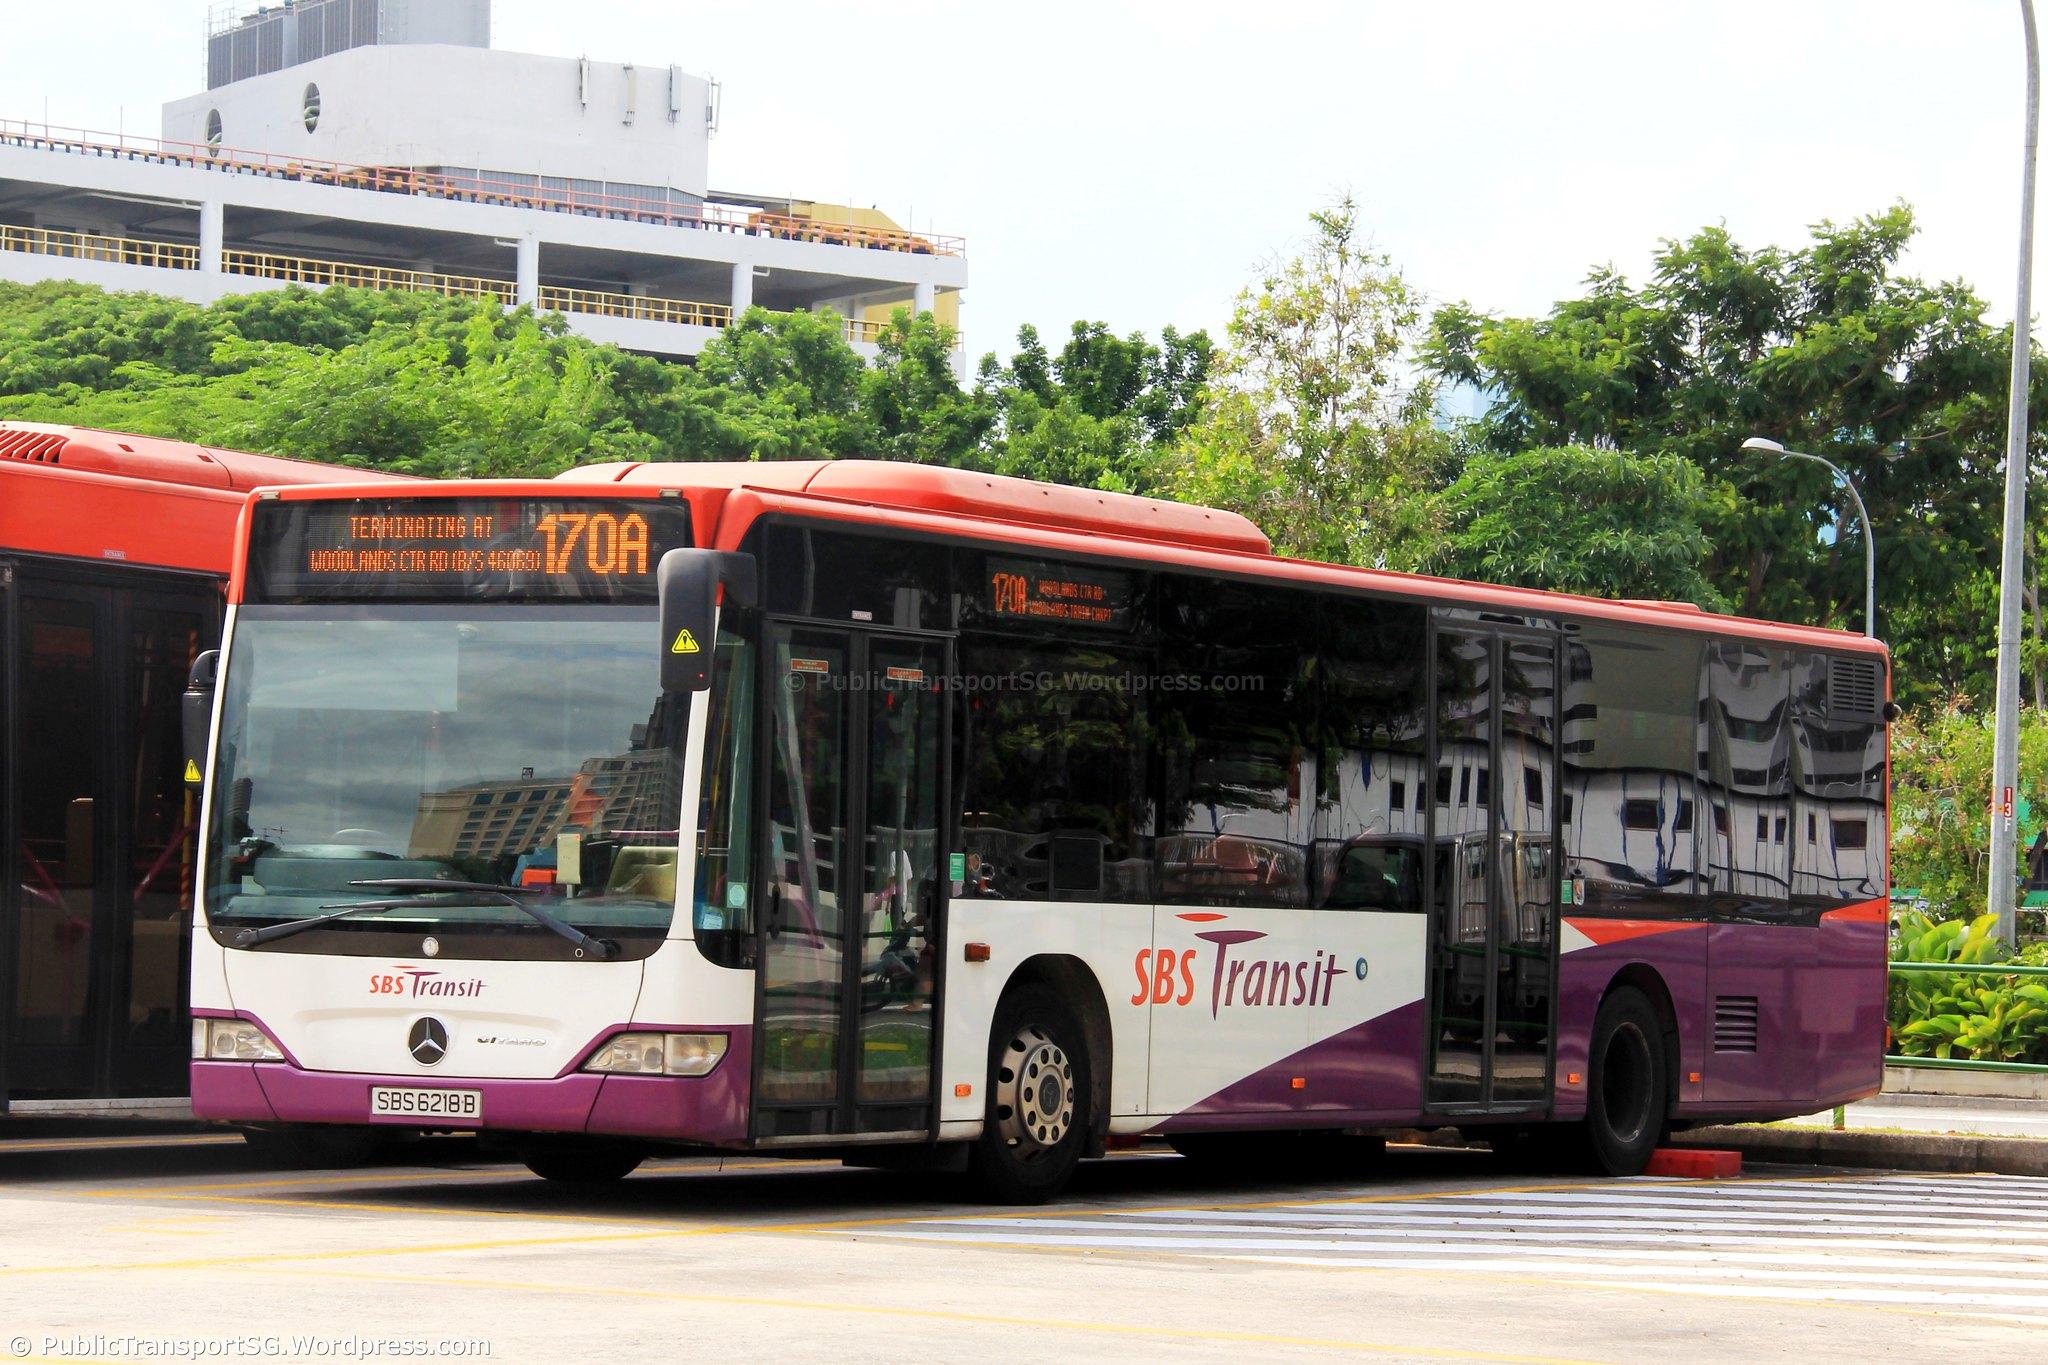 Sbs transit bus service 170a public transport sg for Mercedes benz woodlands service